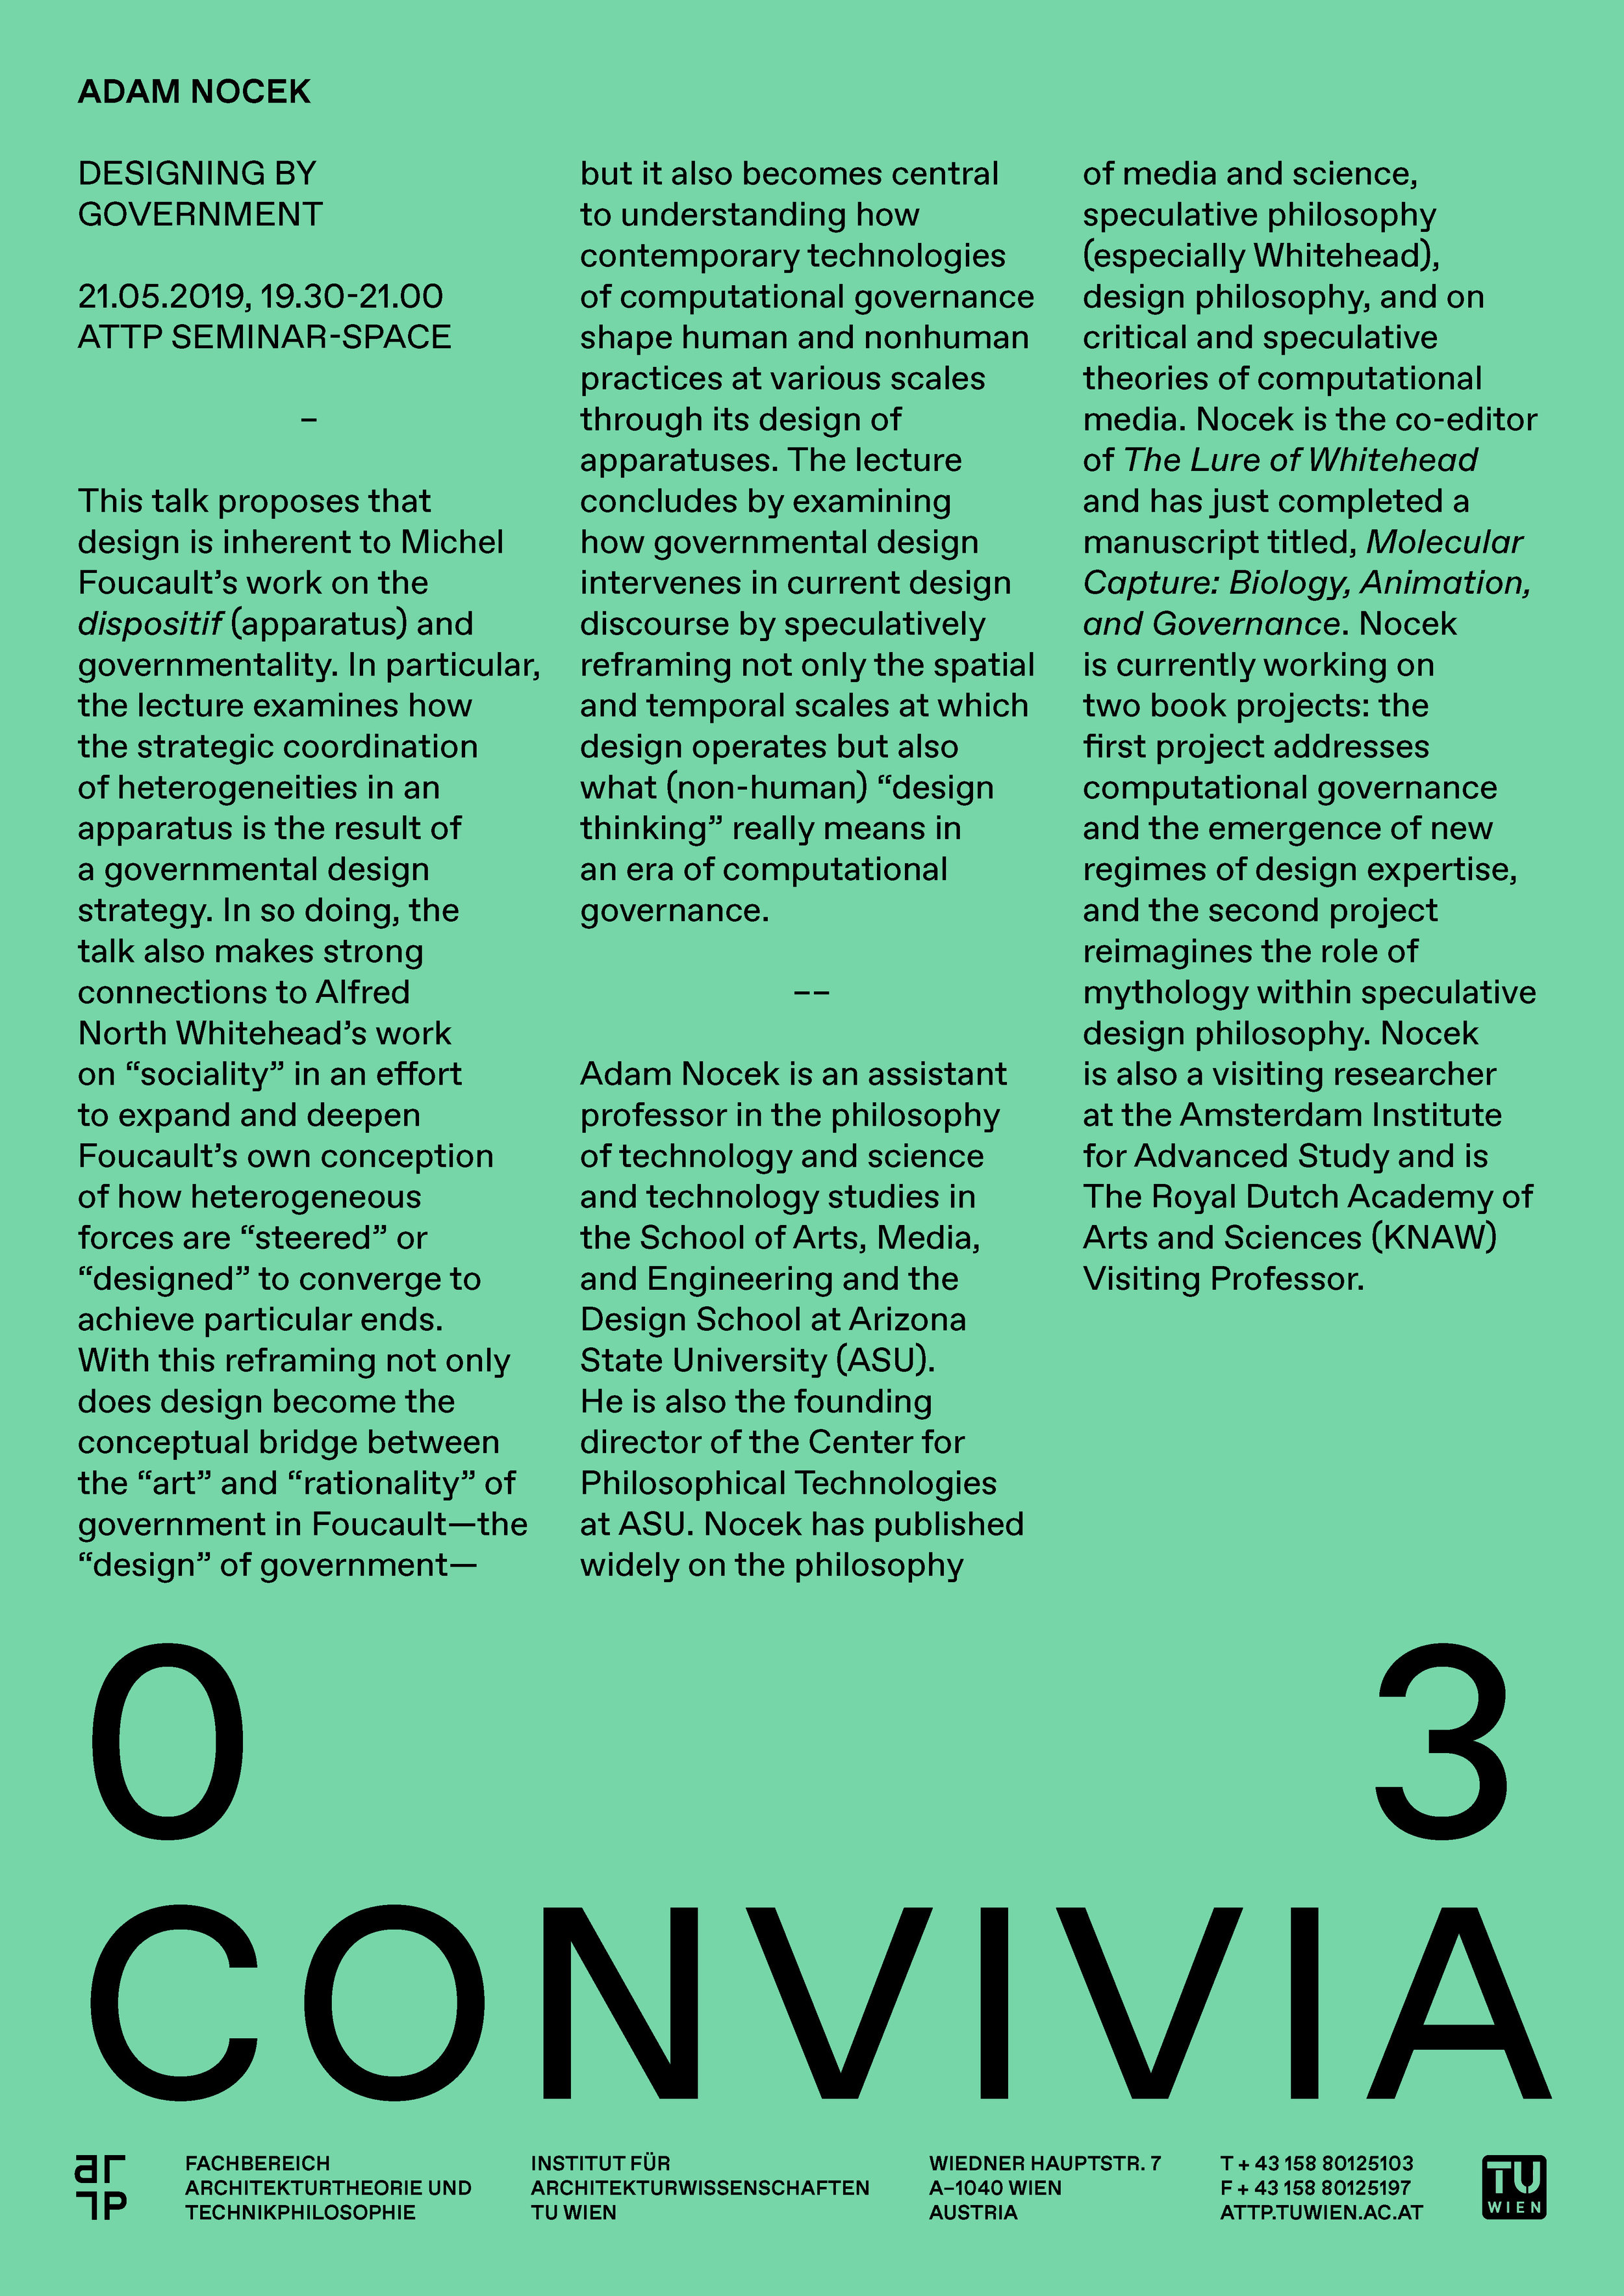 CONVIVIA_03-poster copy.jpg